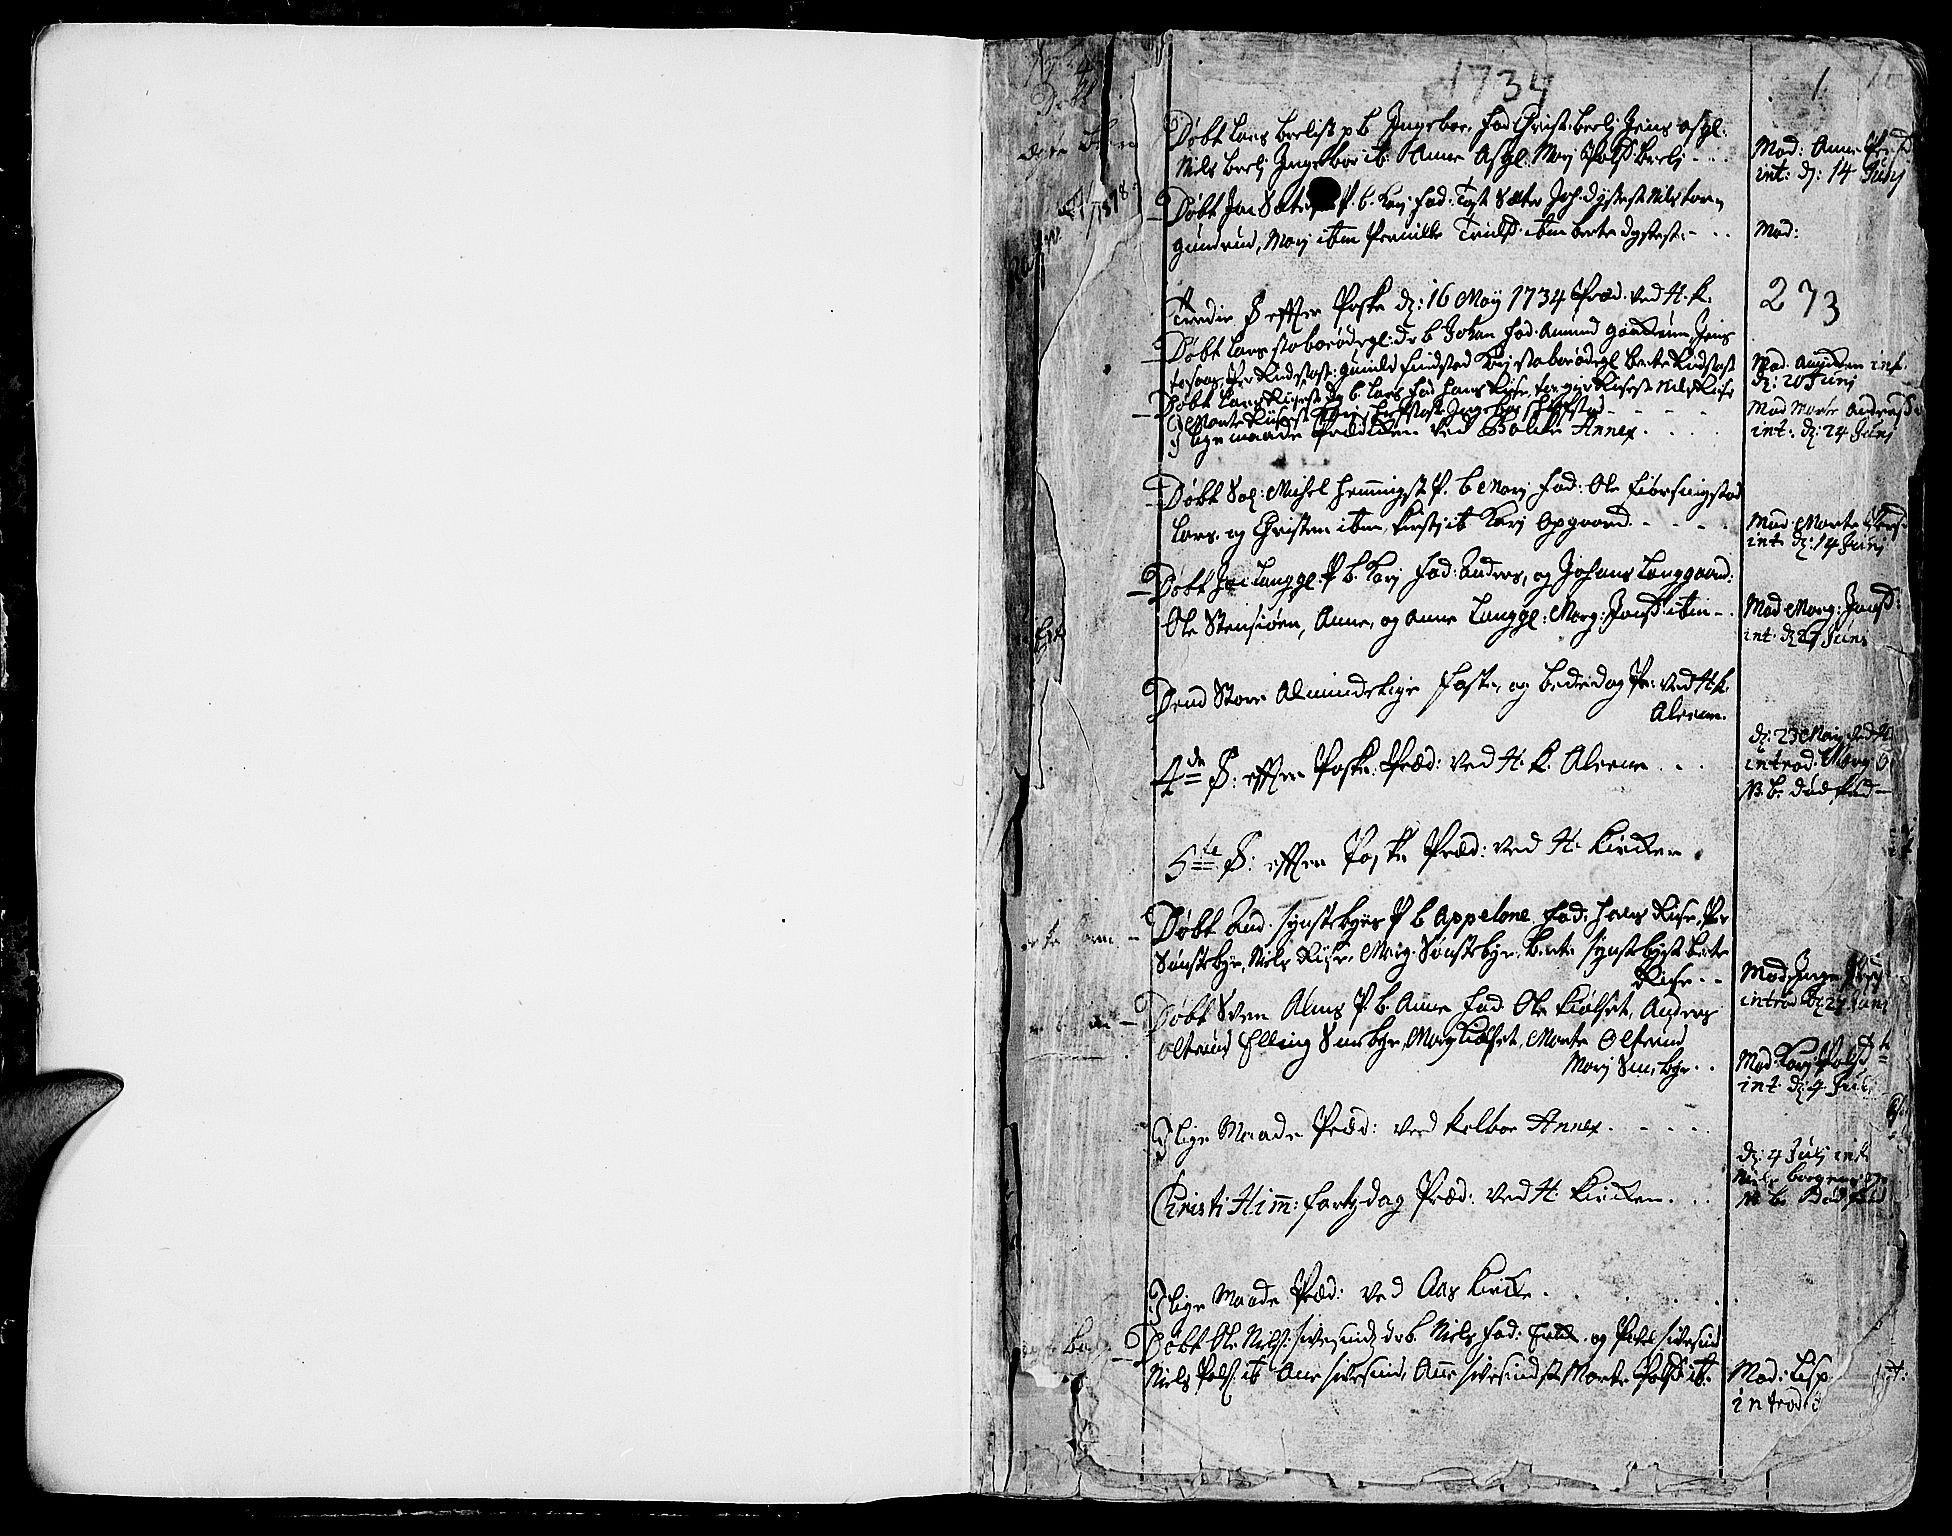 SAH, Toten prestekontor, Ministerialbok nr. 3, 1734-1751, s. 0-1